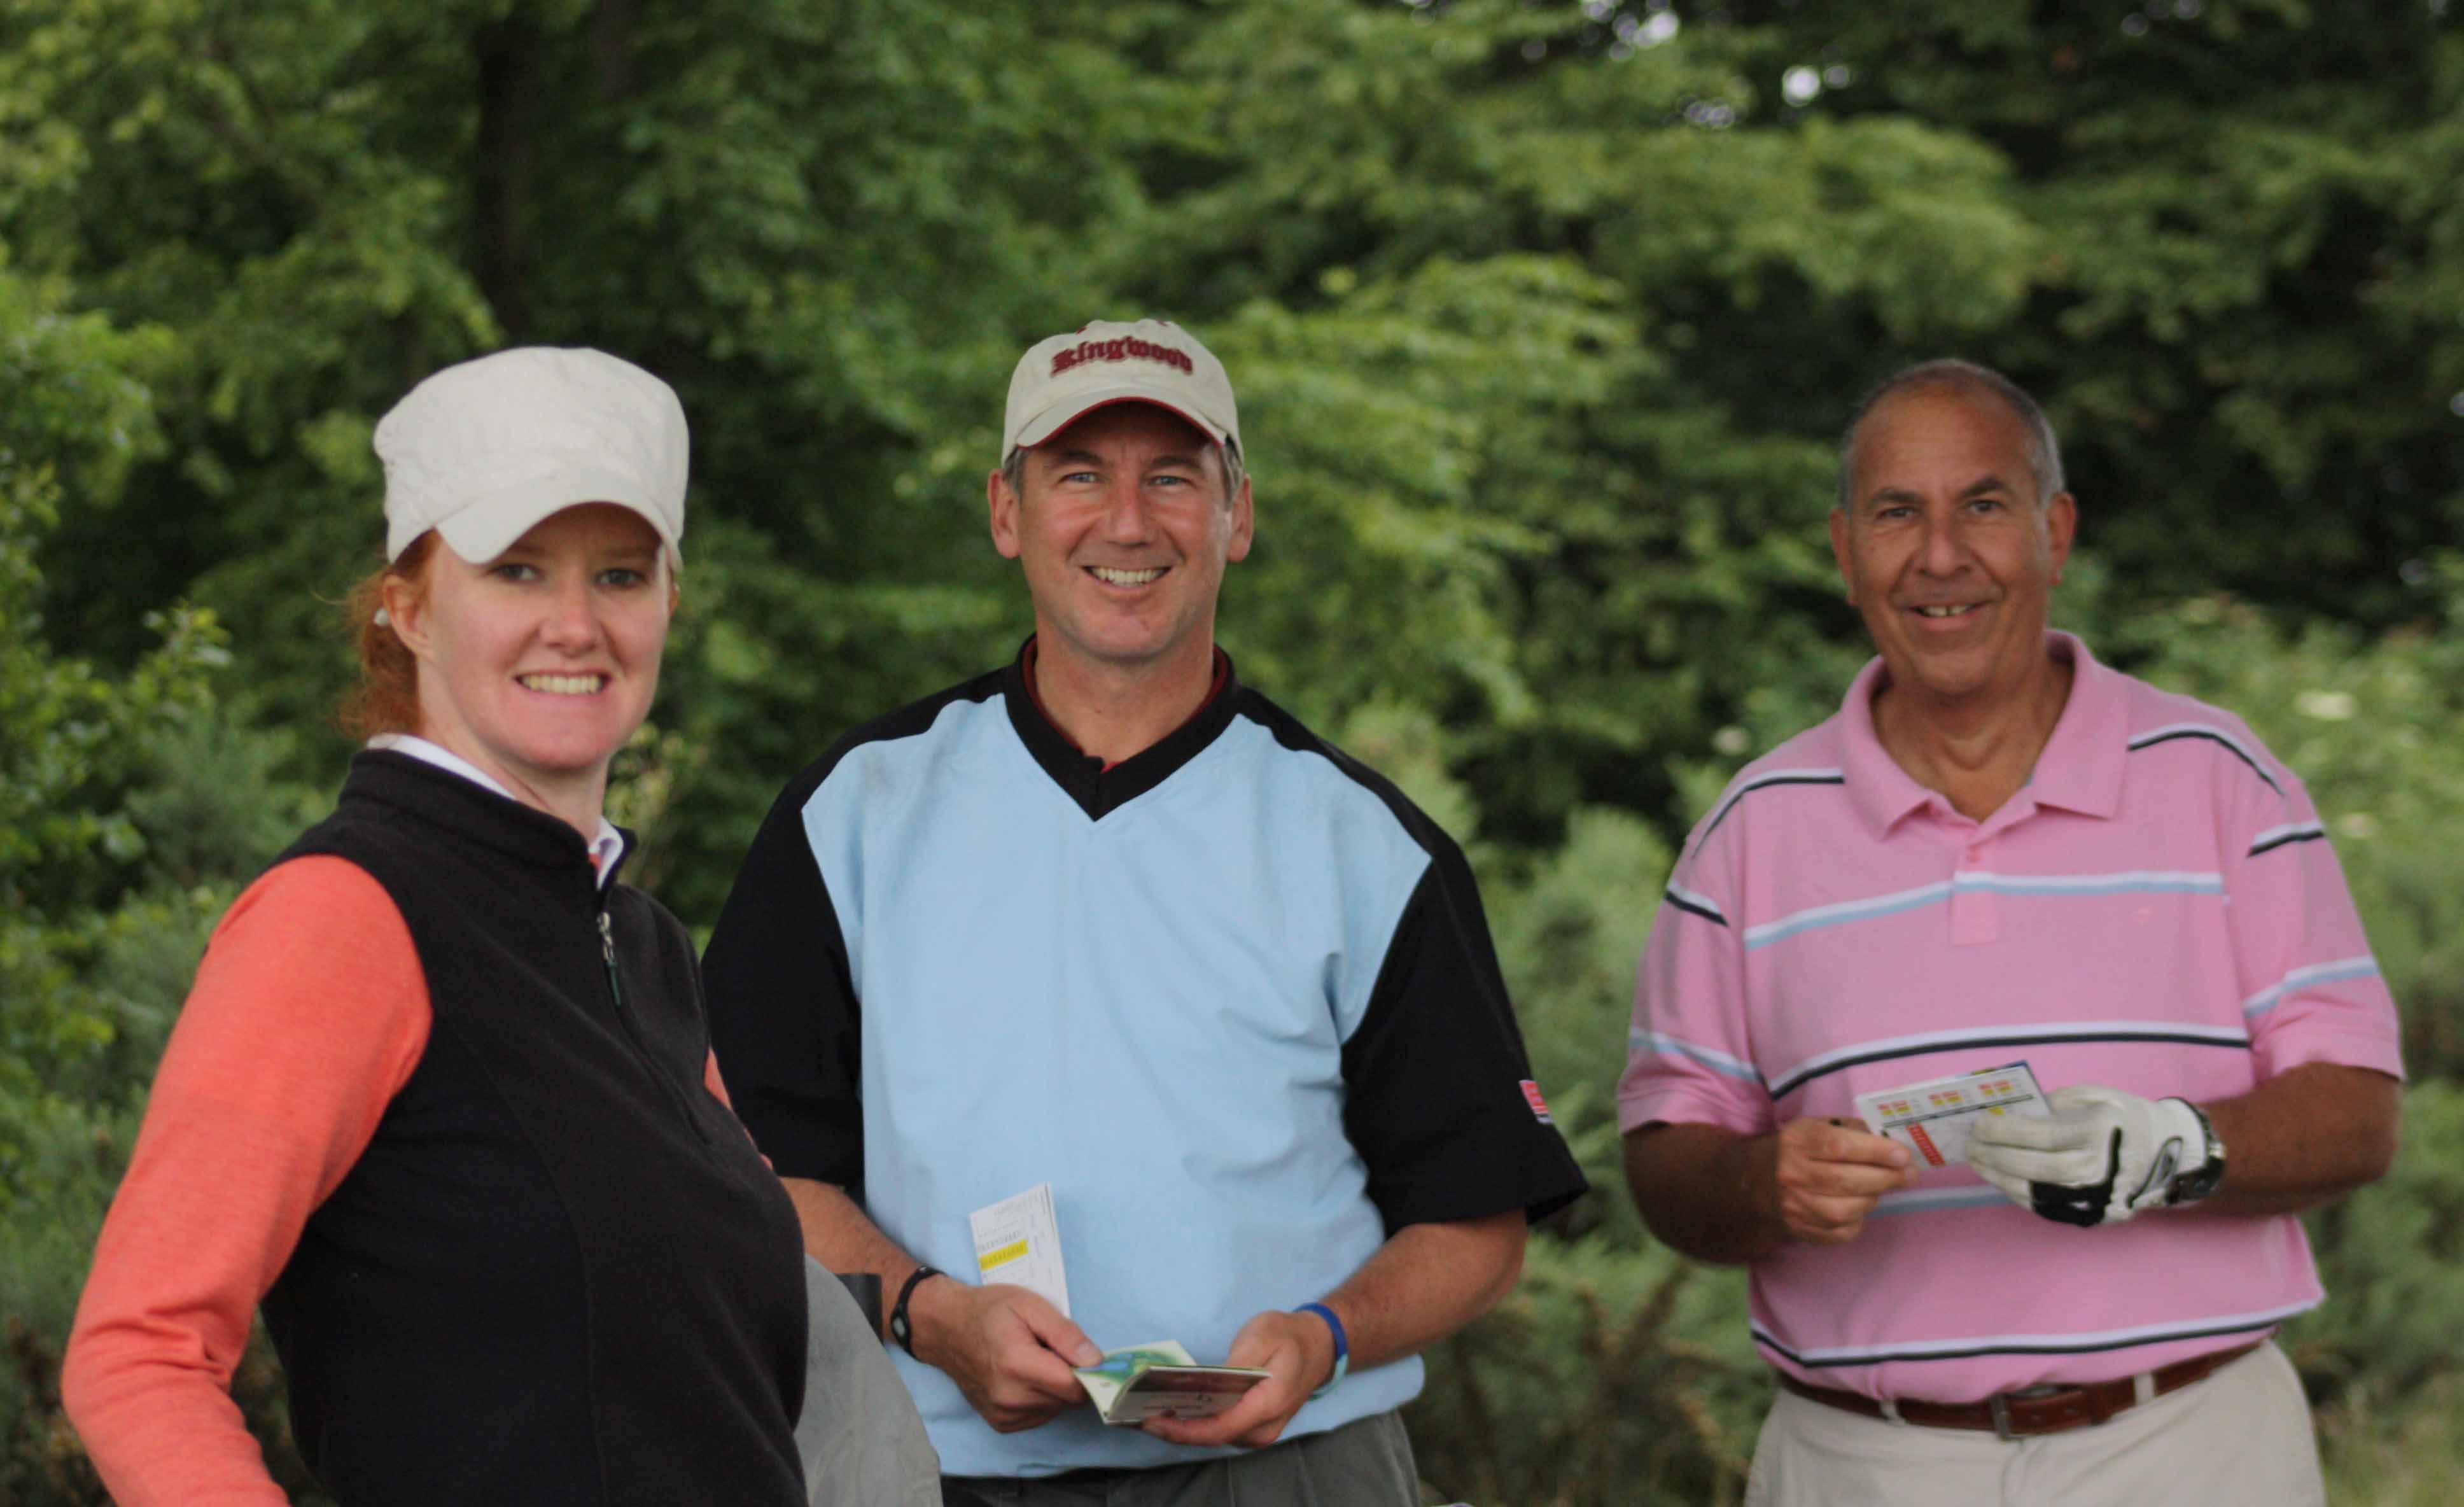 The Social Golfer Newsblog